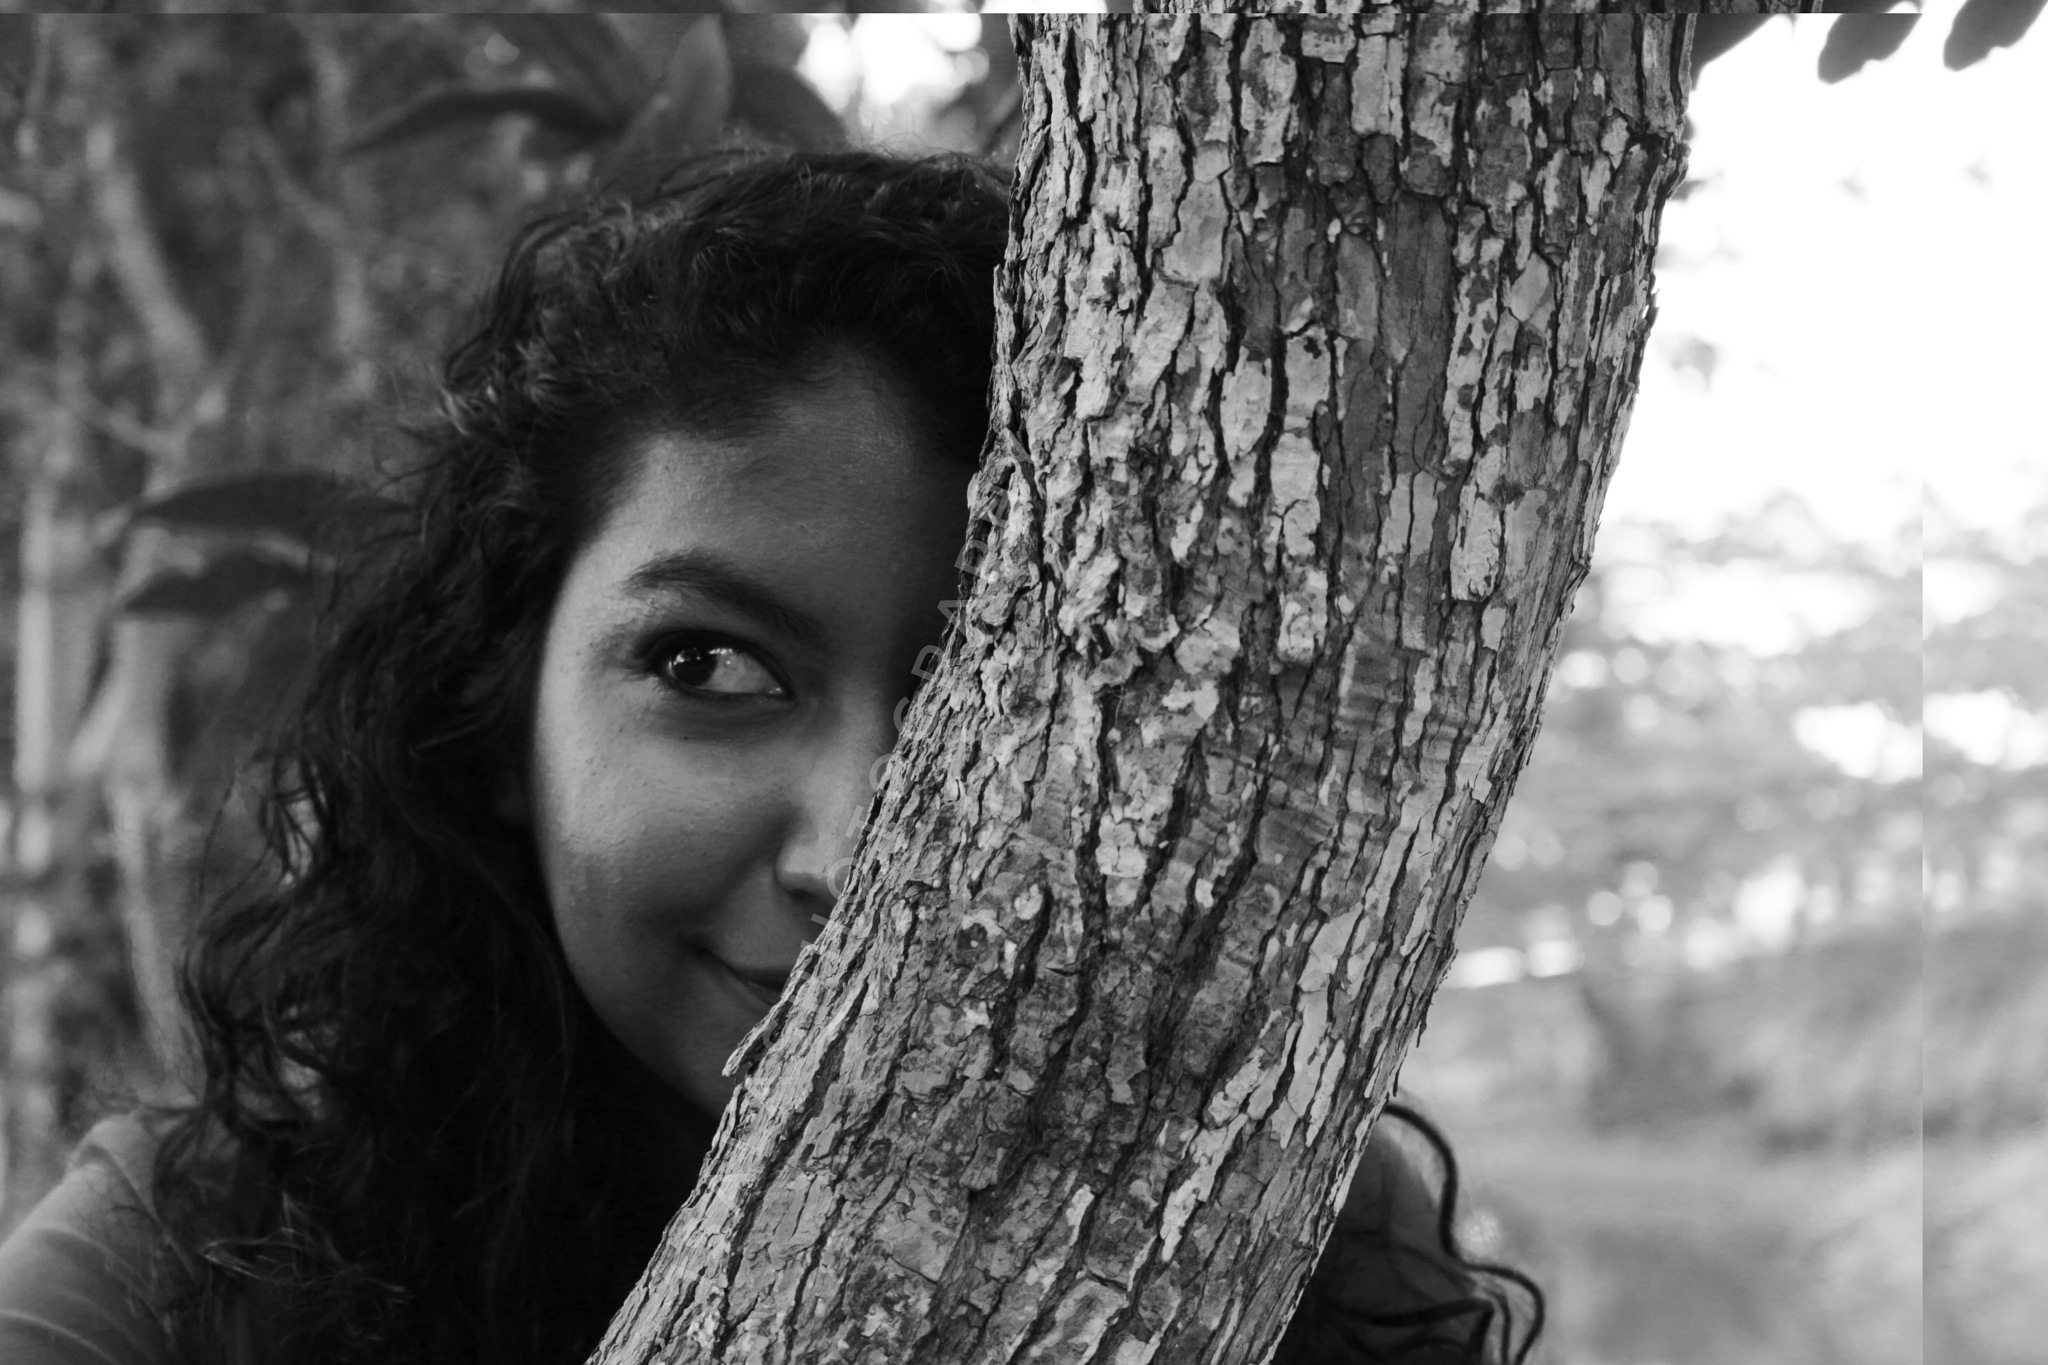 portrait face  by Adriana Salas